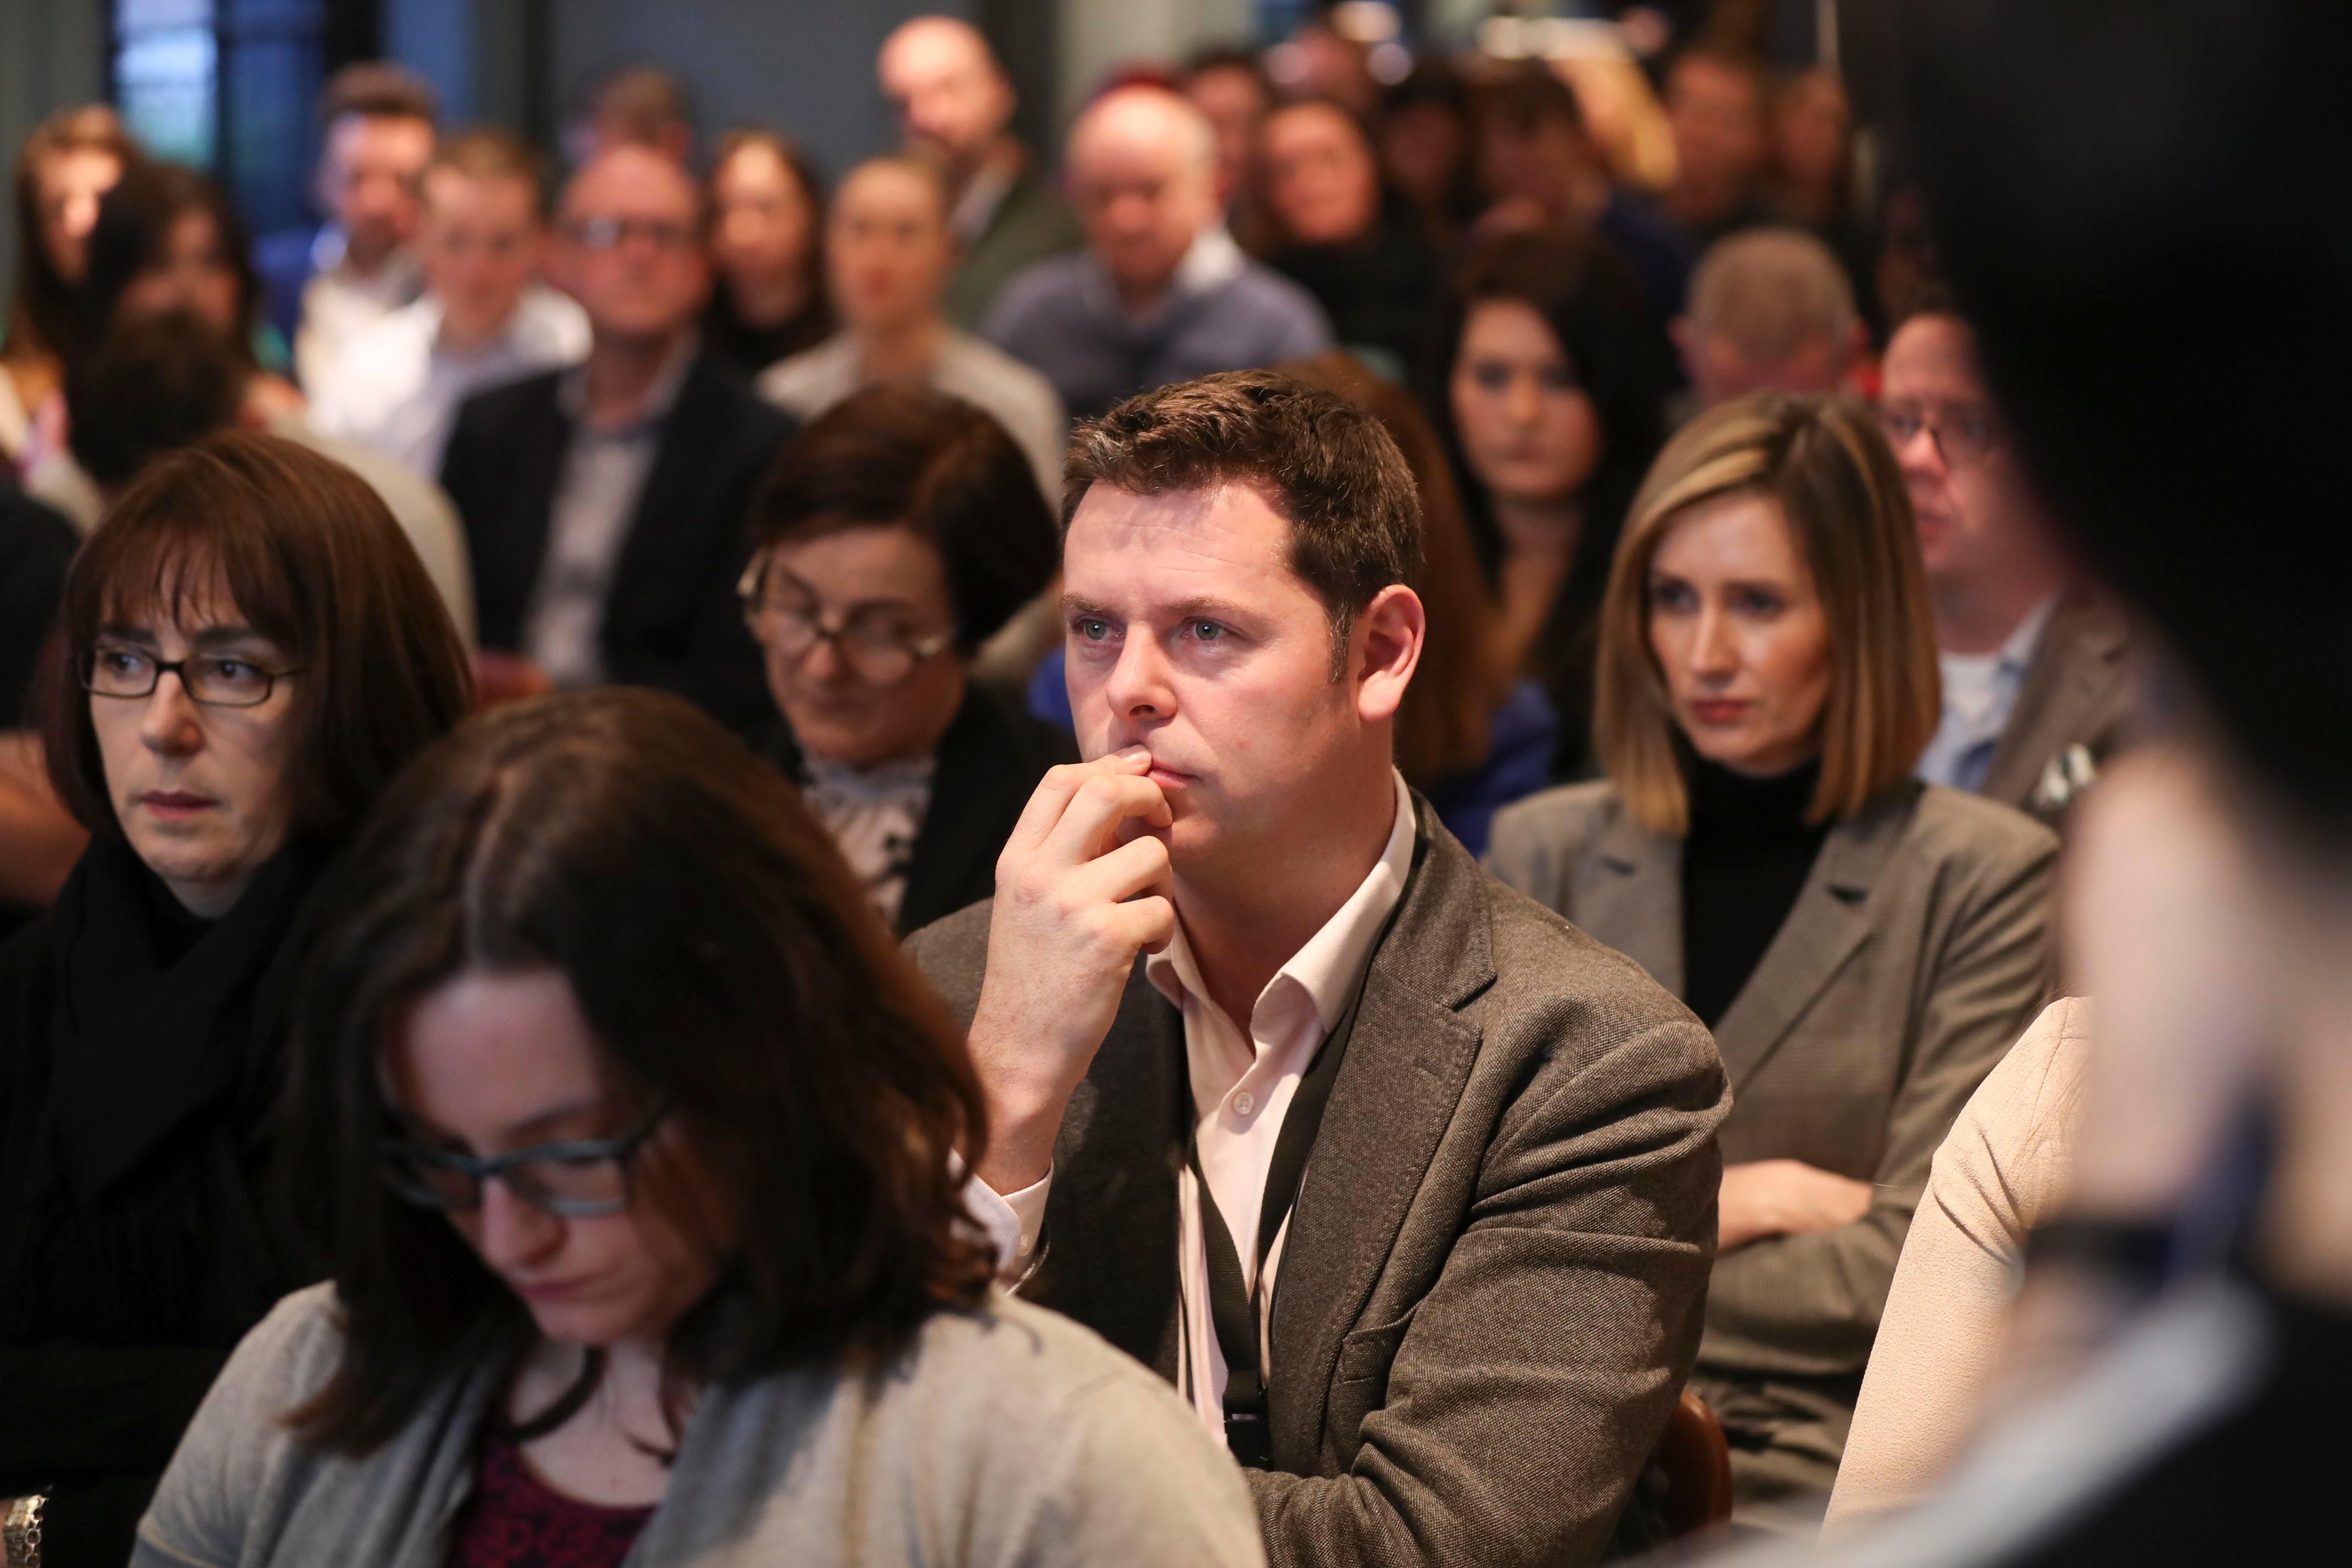 Launch of the Irish B2B Digital Marketing Survey 2020 Report - Squaredot and MII